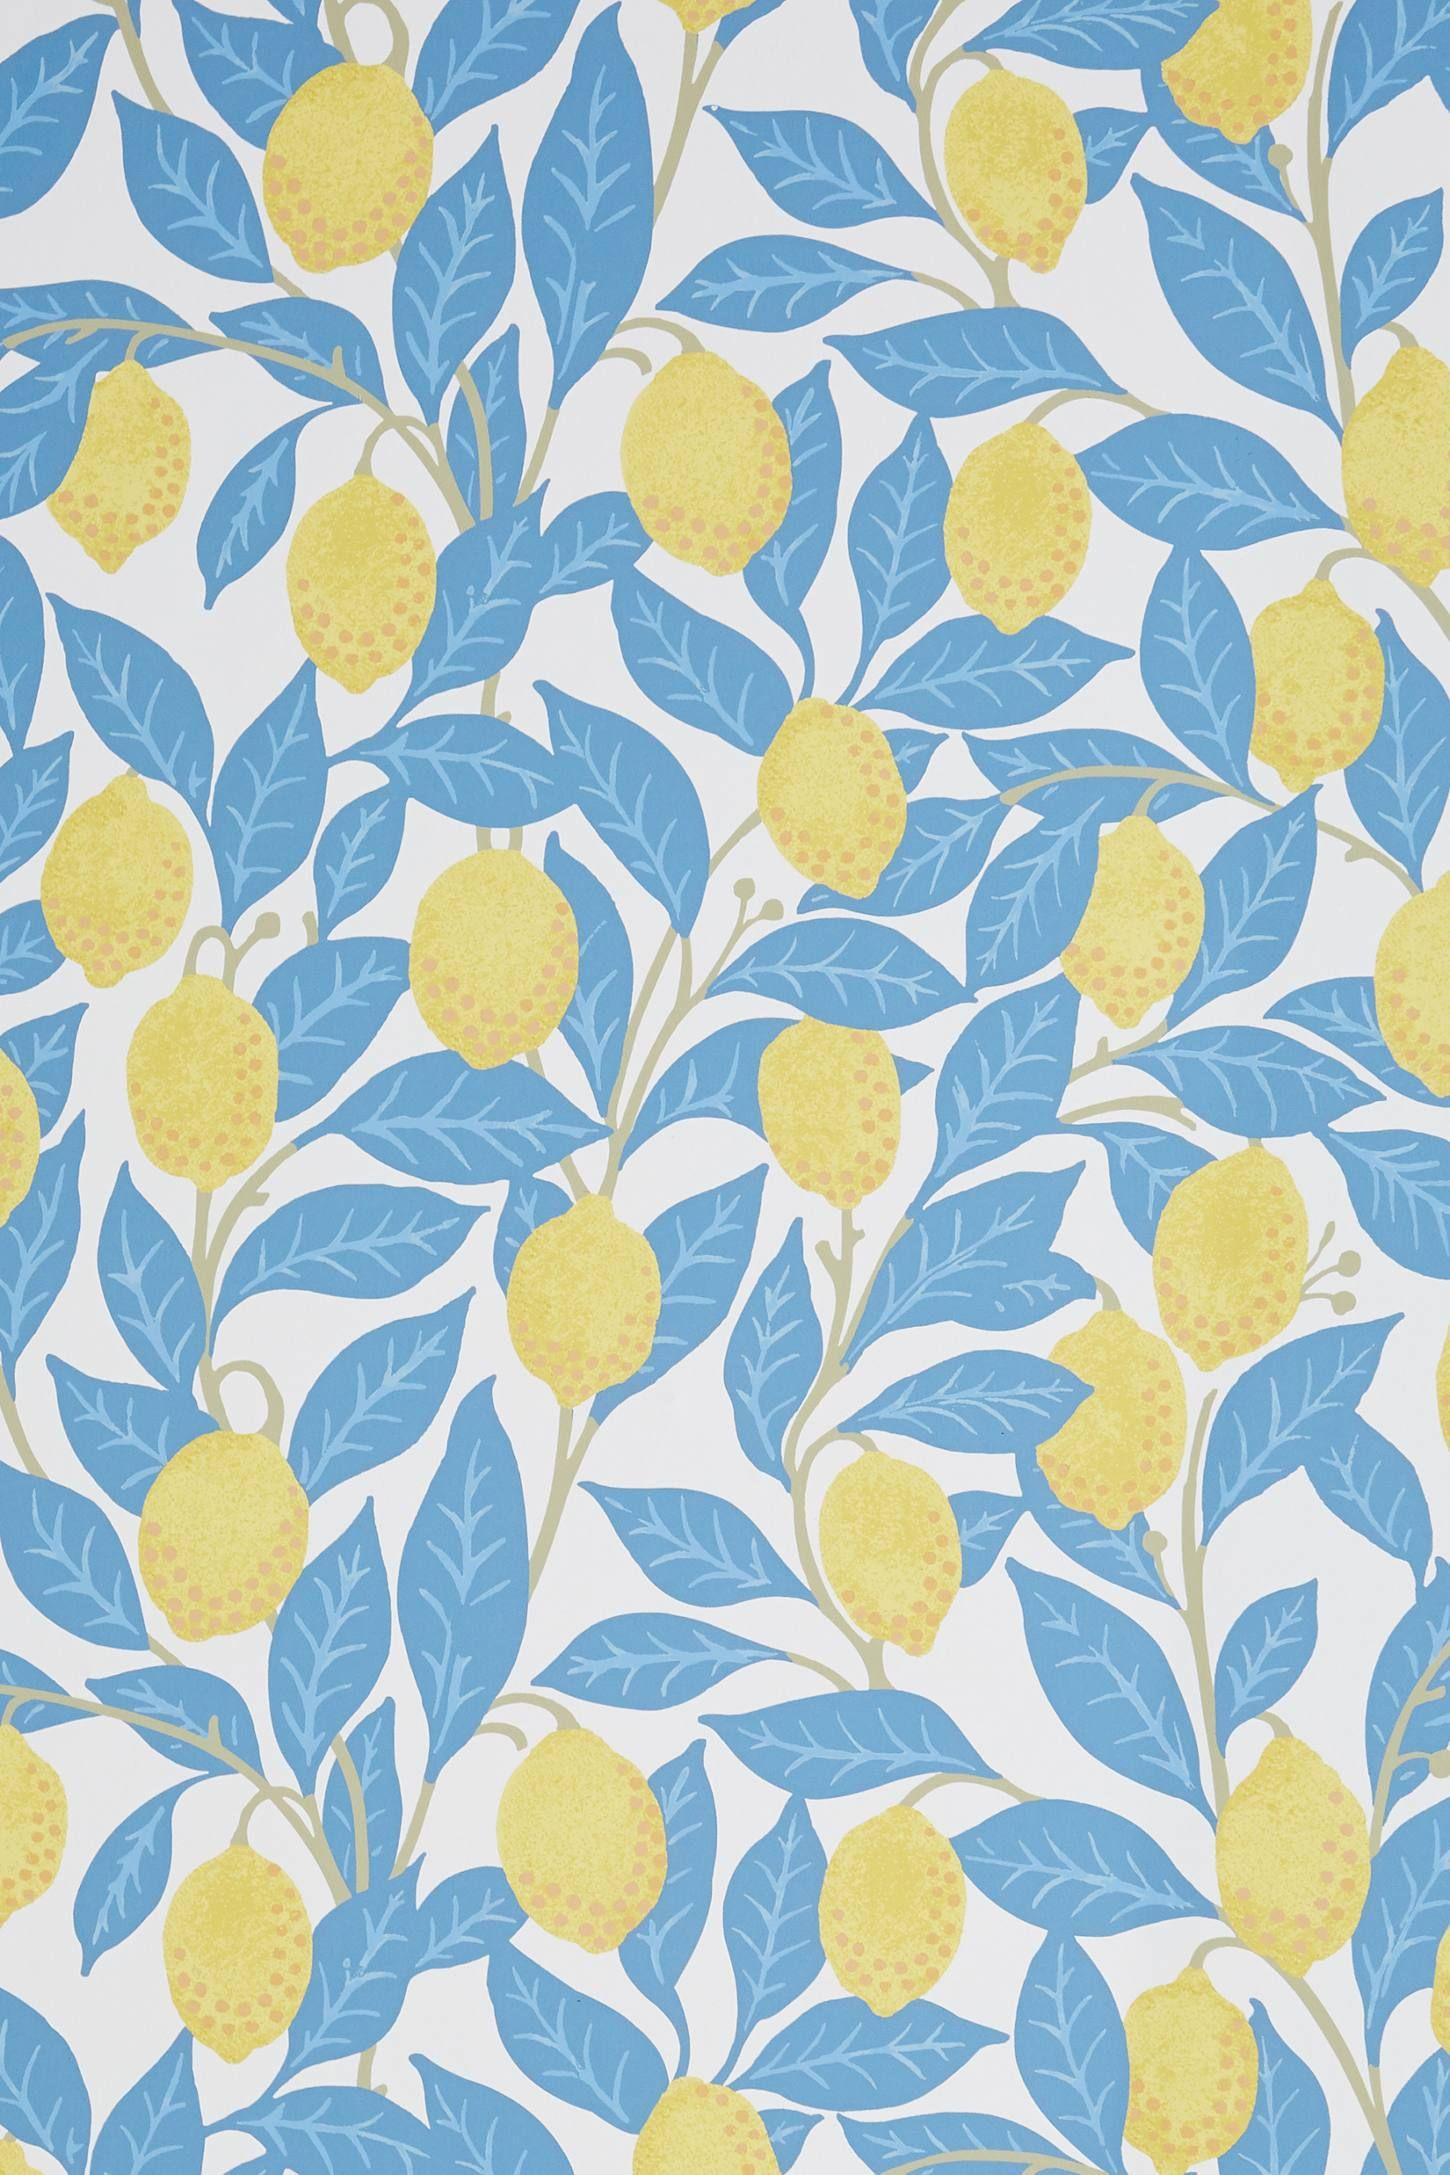 Lemons Wallpaper Wallpaper Anthropologie Wallpaper Accent Wallpaper